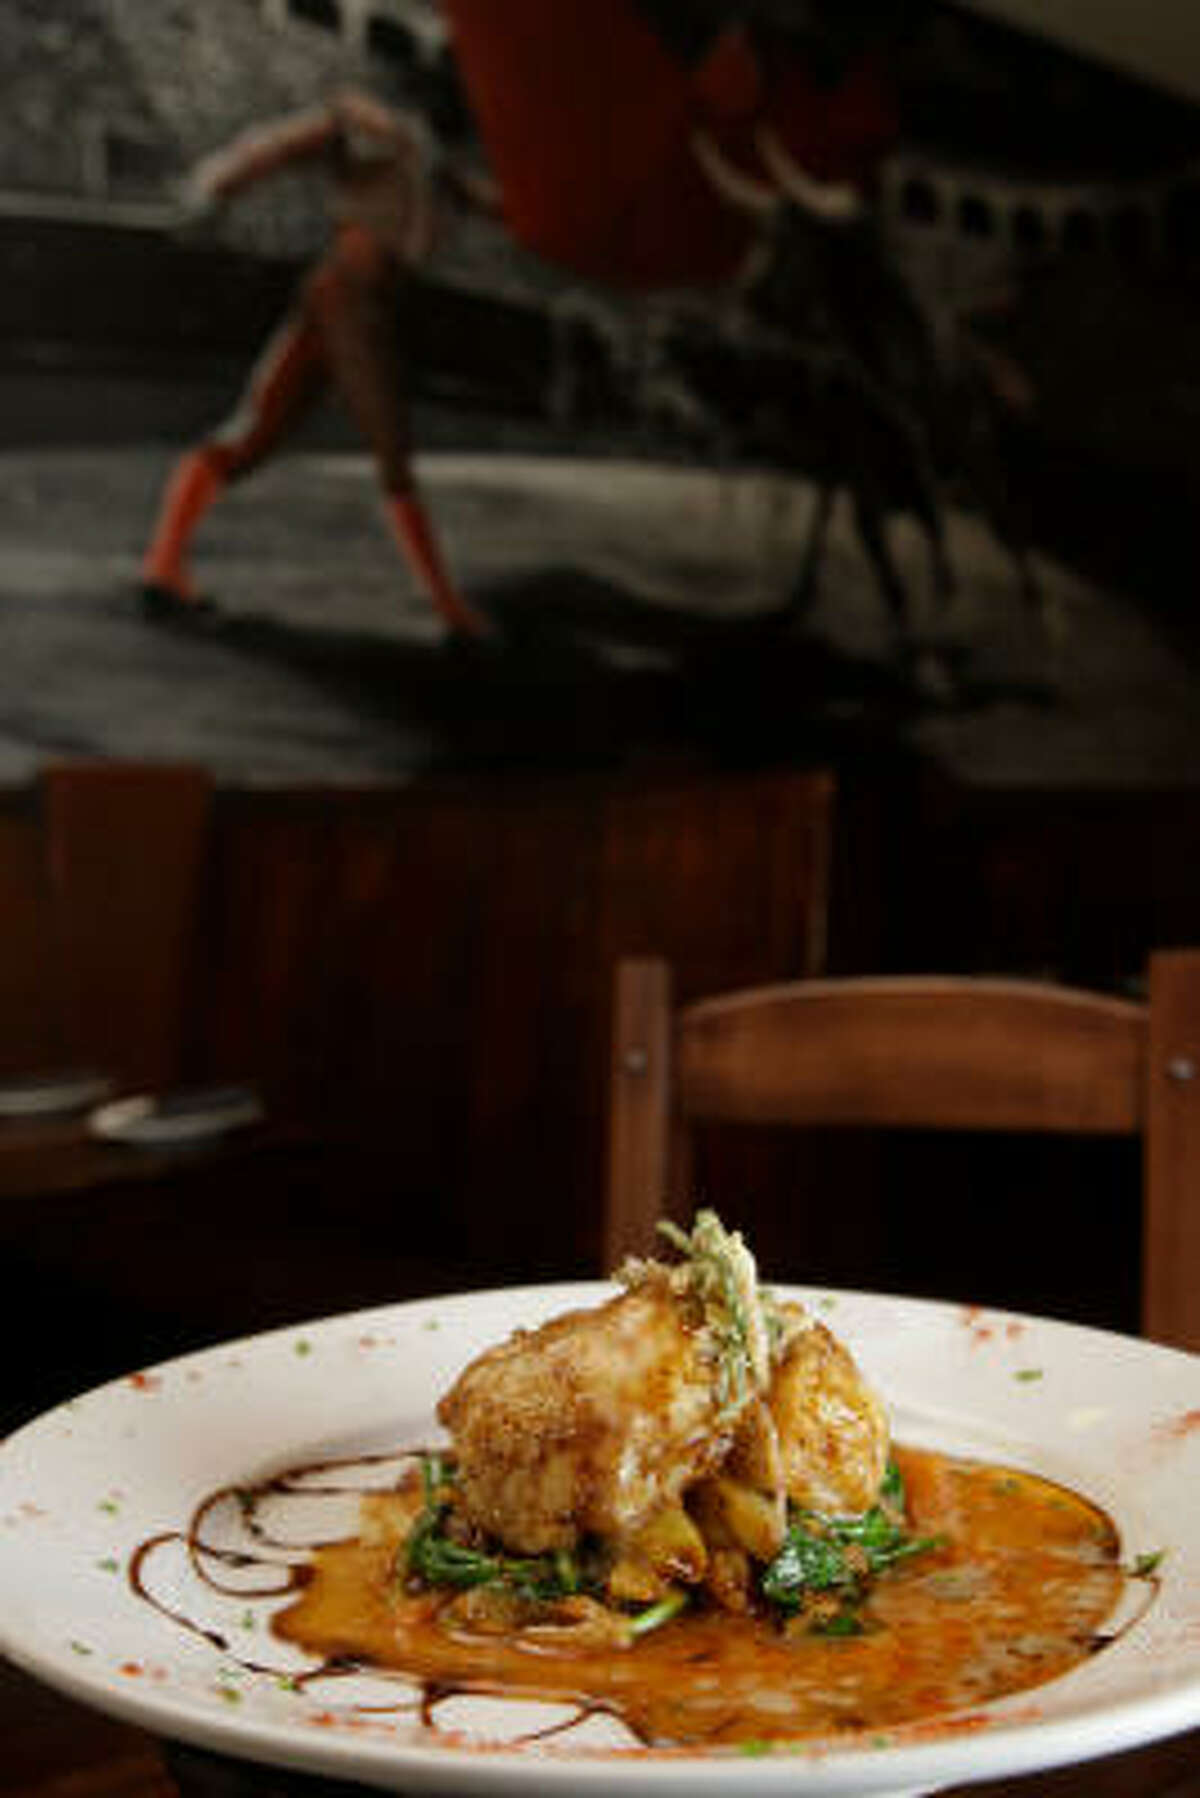 Vieras á la Marbella — sautéed sea scallops — are on the menu at Andalucia Tapas Restaurant & Bar.